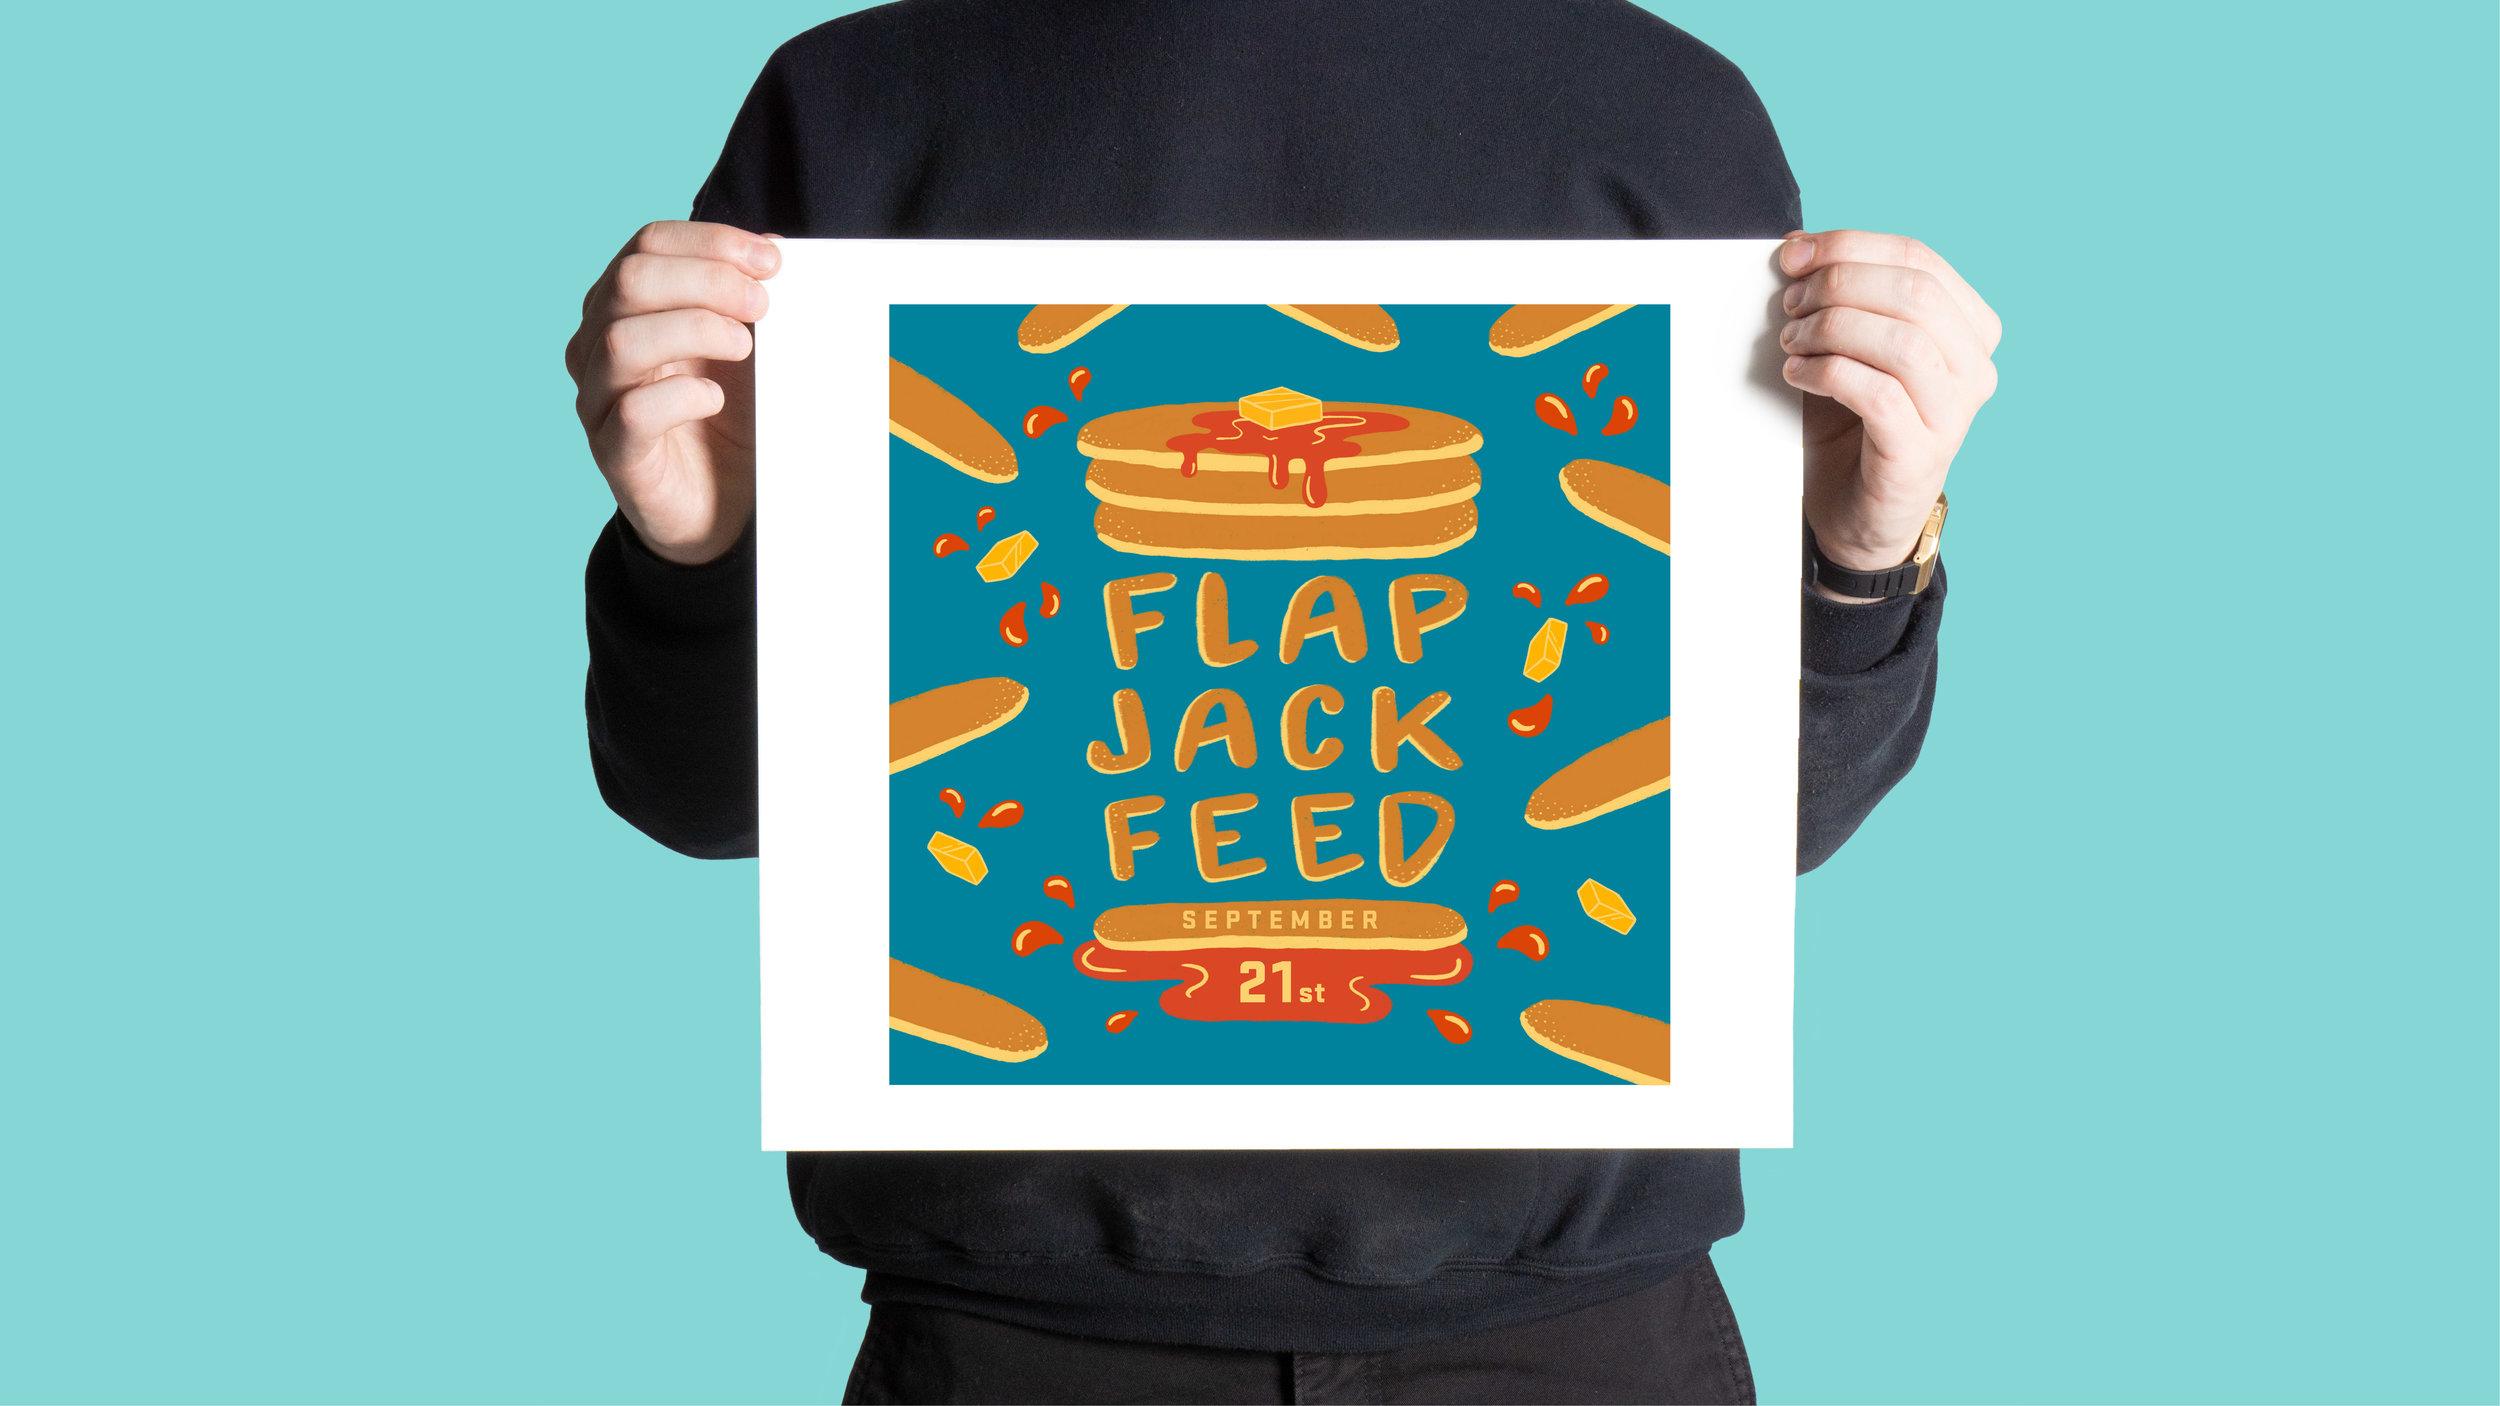 FLAP_JACK_FEED_AD